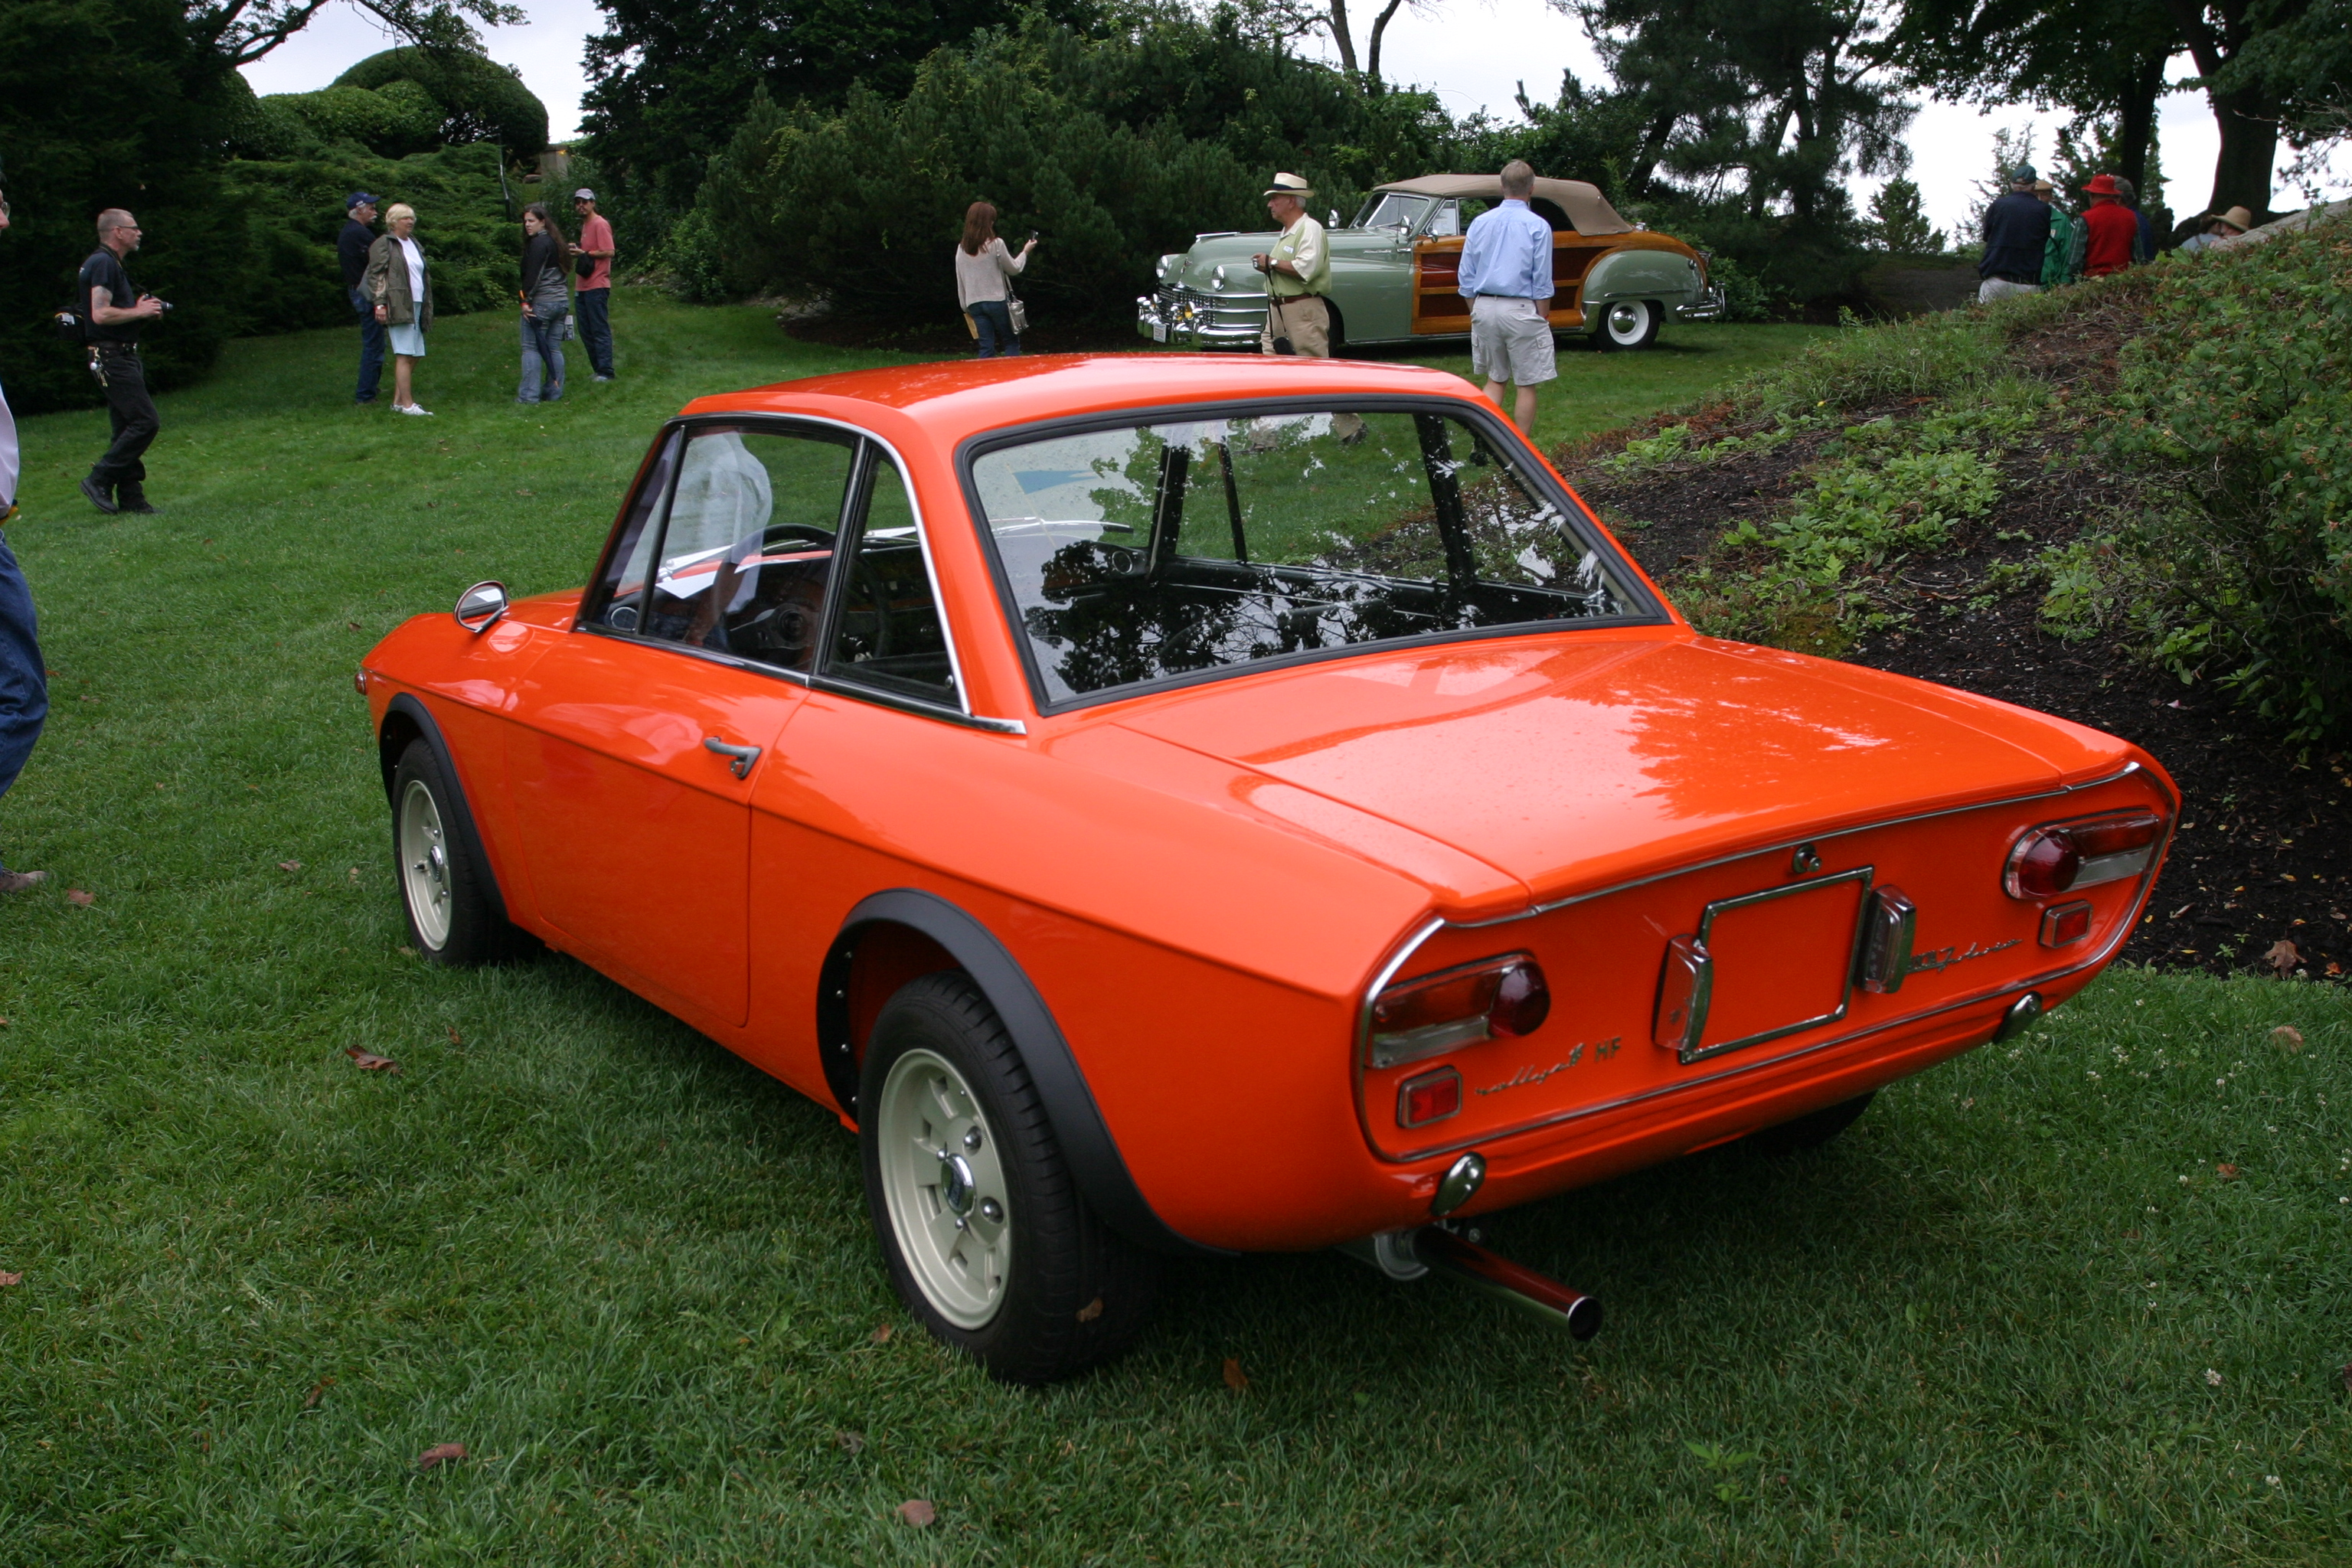 http://upload.wikimedia.org/wikipedia/commons/d/d3/Lancia_Fulvia_HF_Fanalone_1970_-_2.jpg